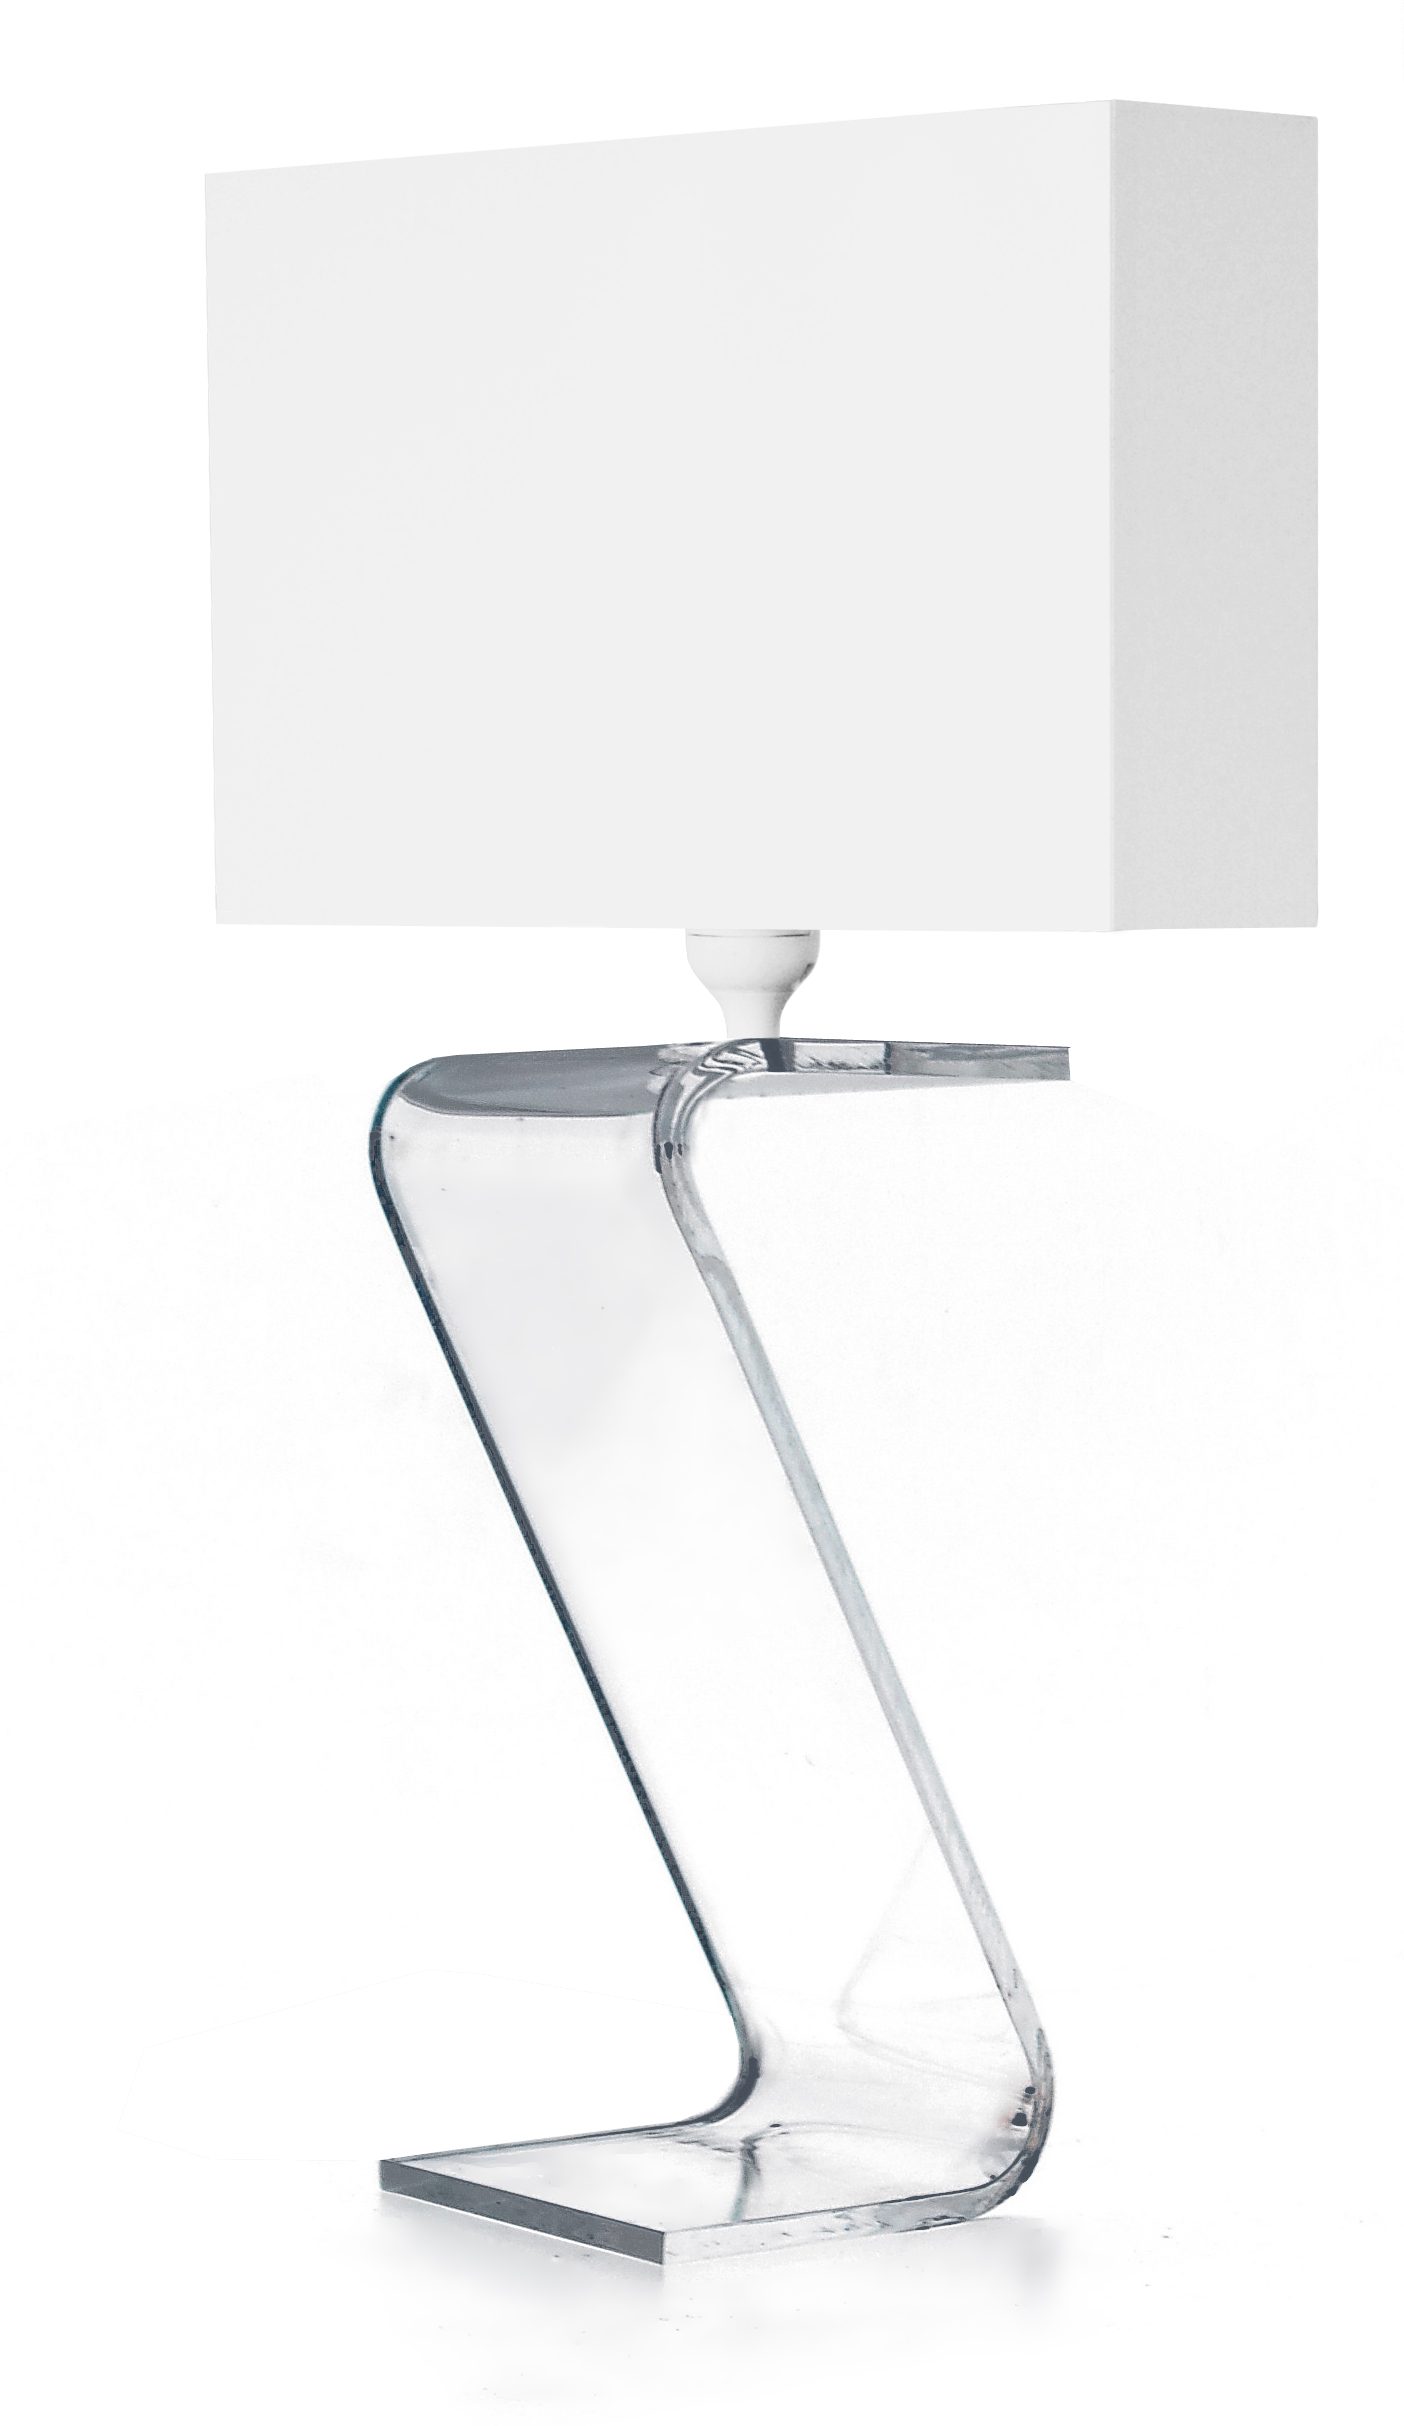 lampeZ transparente.jpg